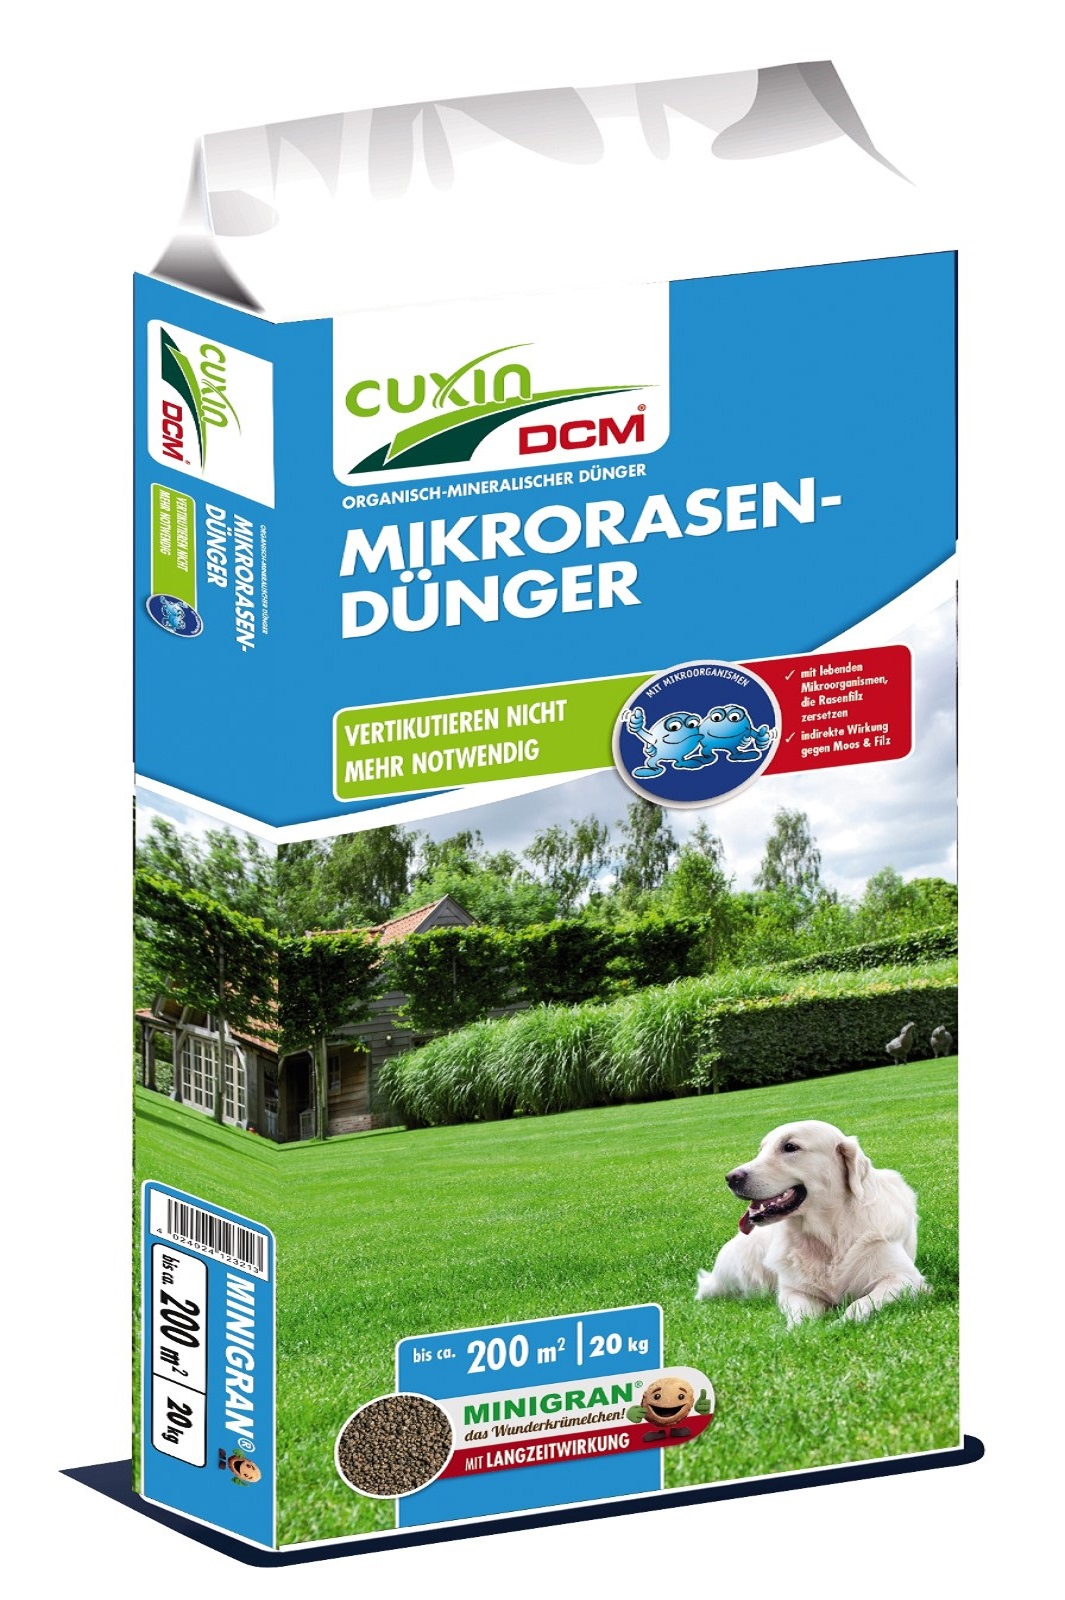 Cuxin DCM Mikro Rasendünger 20 Kg